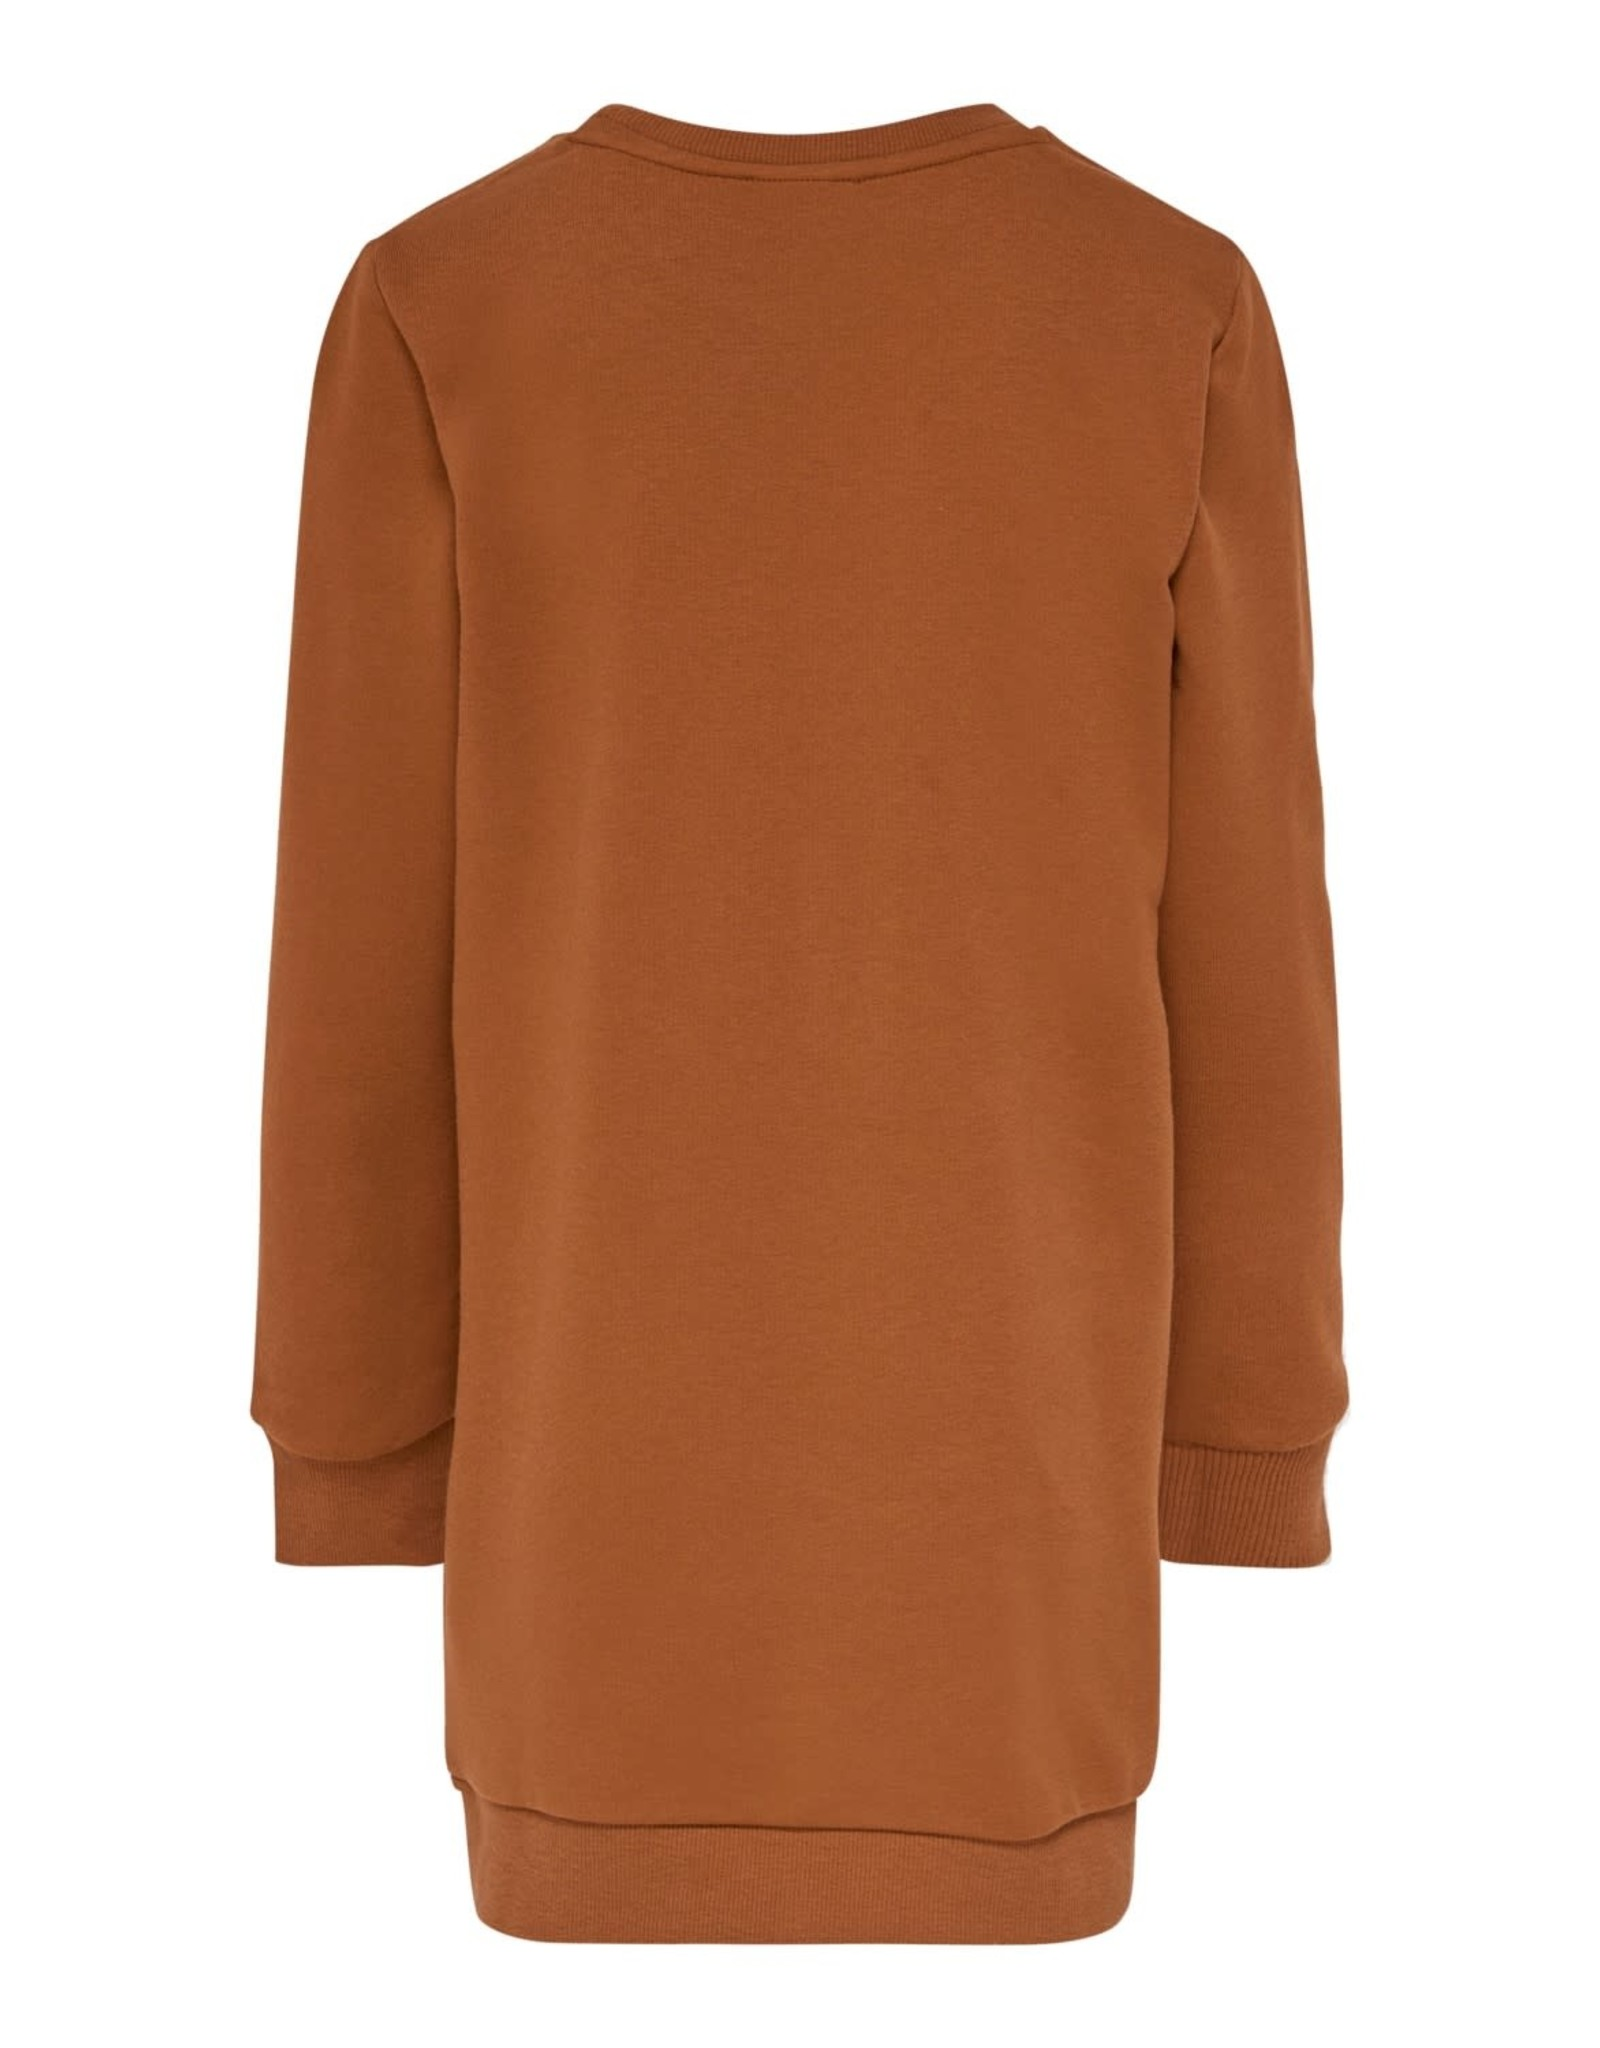 KIDS ONLY Gingerbread bruin sweater kleed